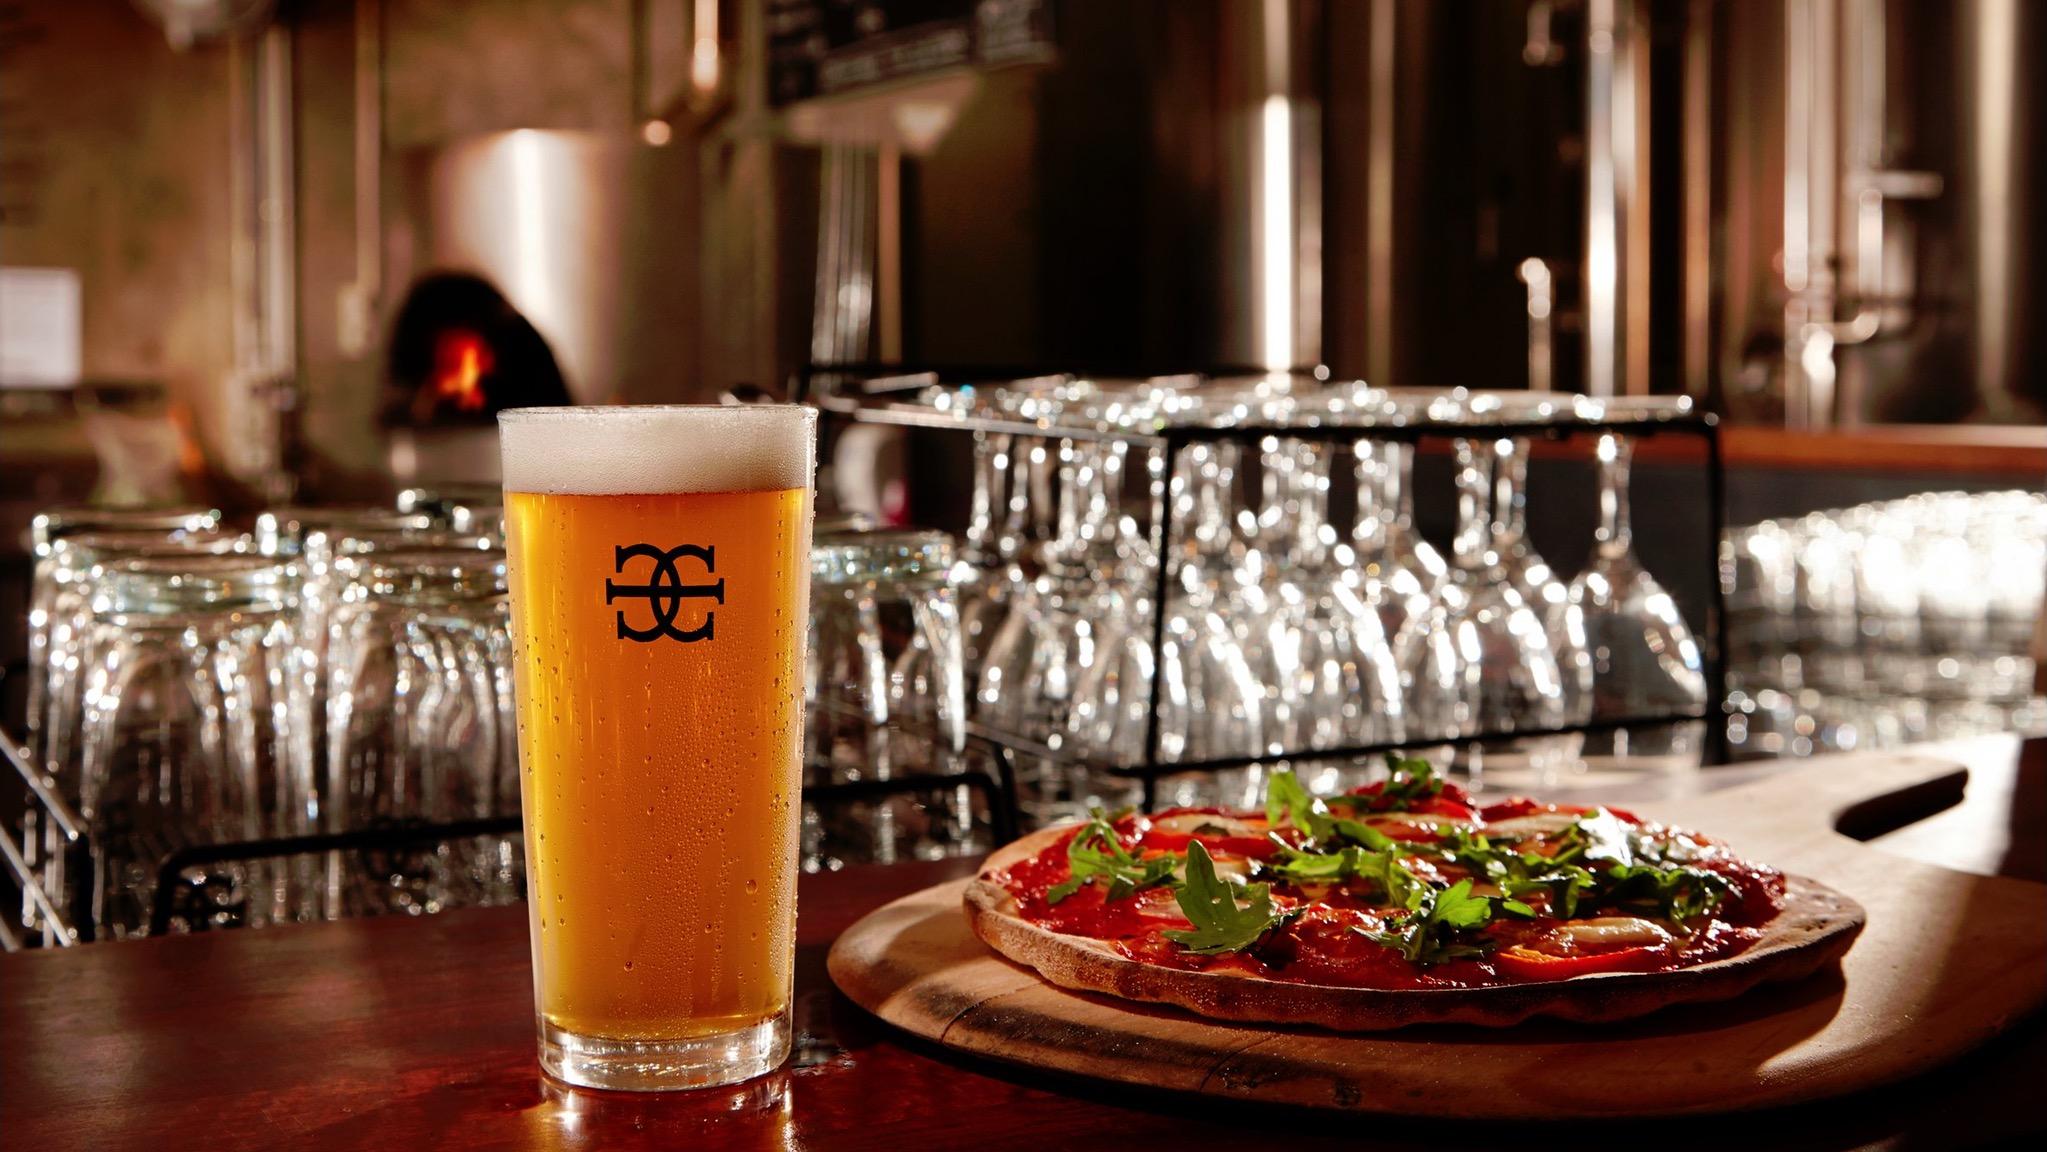 Mornington Peninsula Brewery Pale and pizza